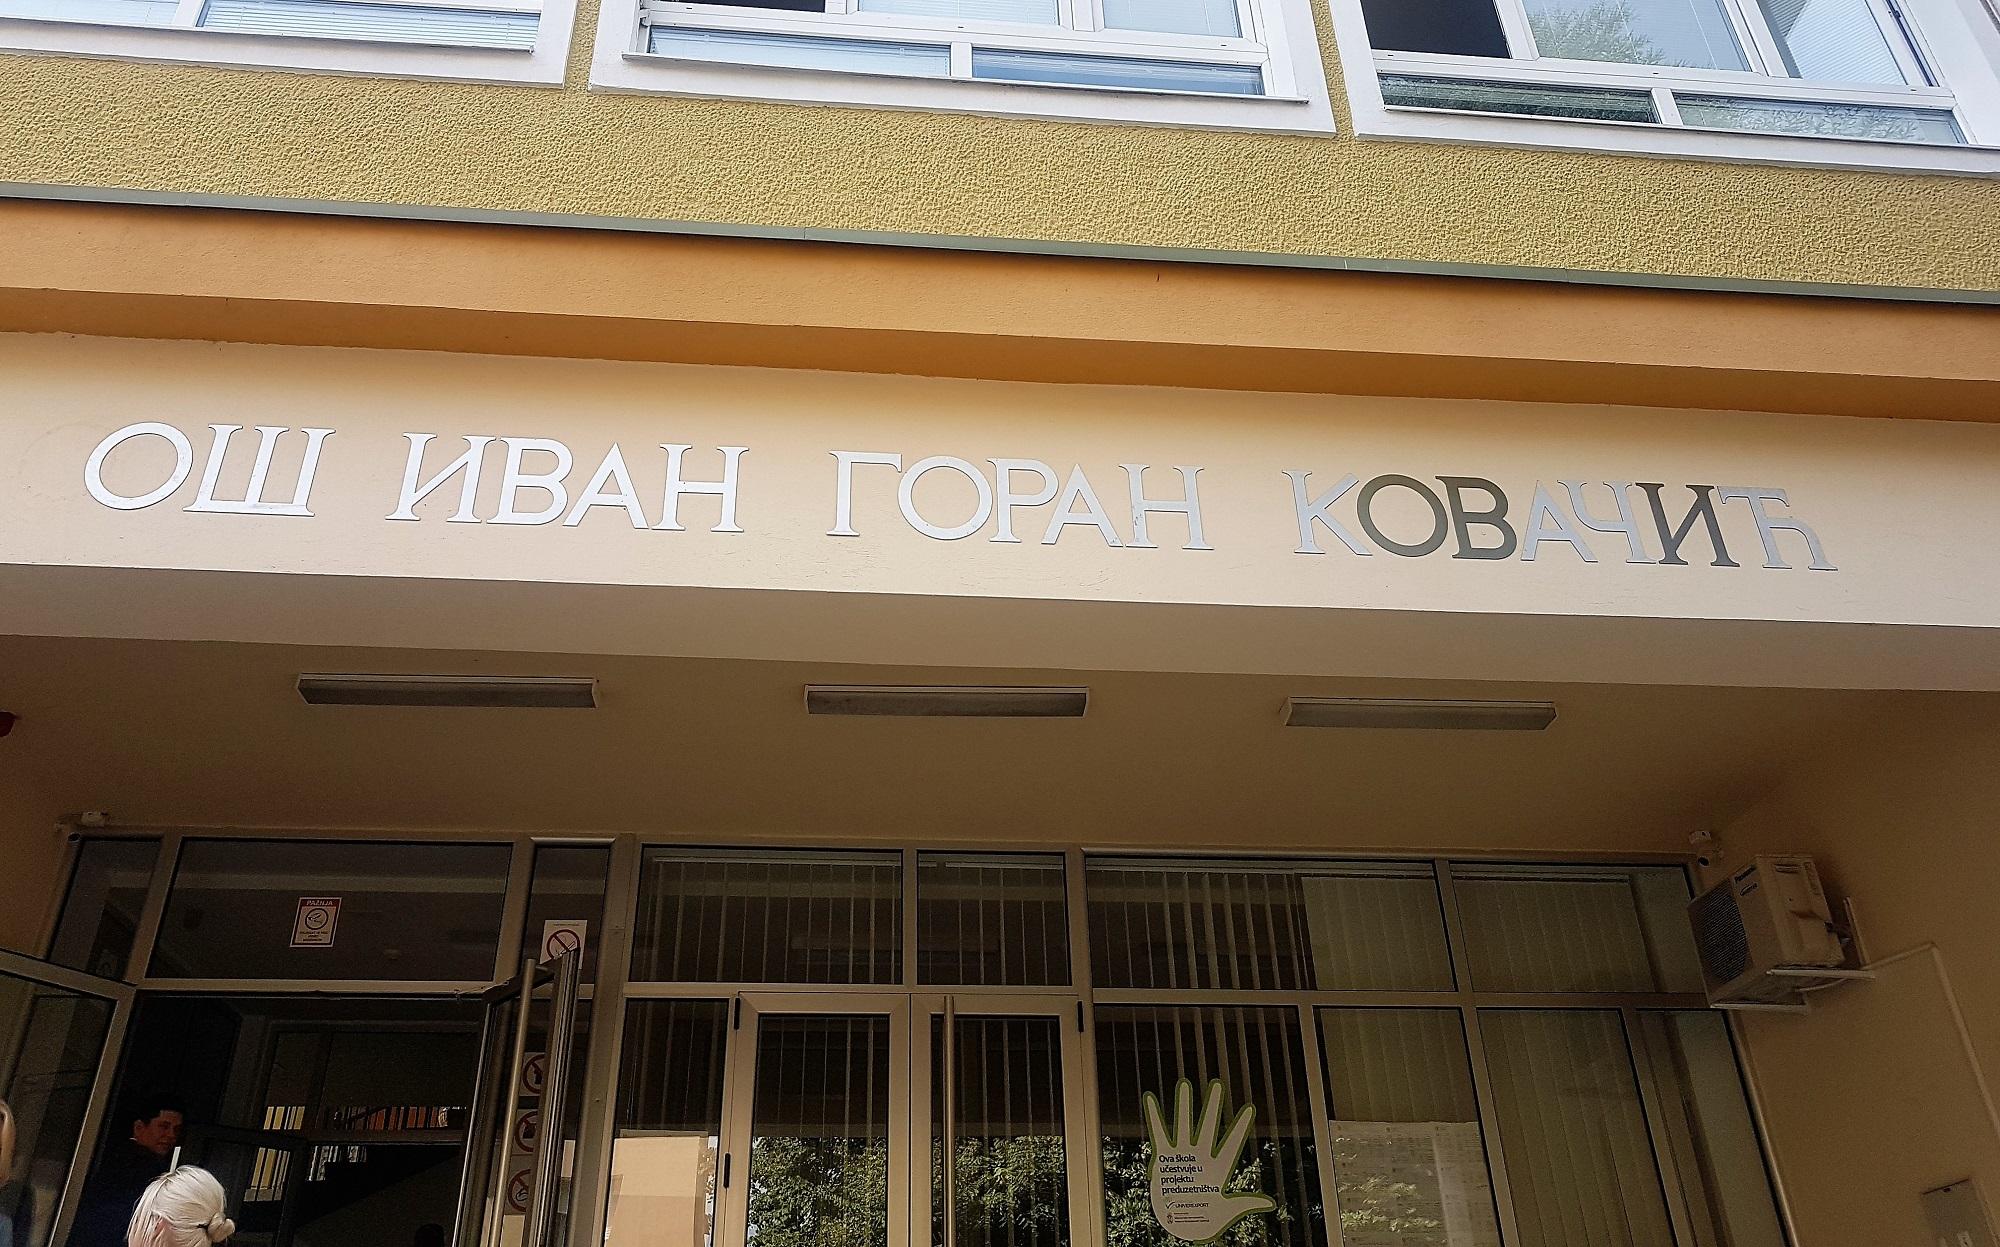 Bezbednost U Zoni Skola Na Najvisem Nivou Grad Beograd